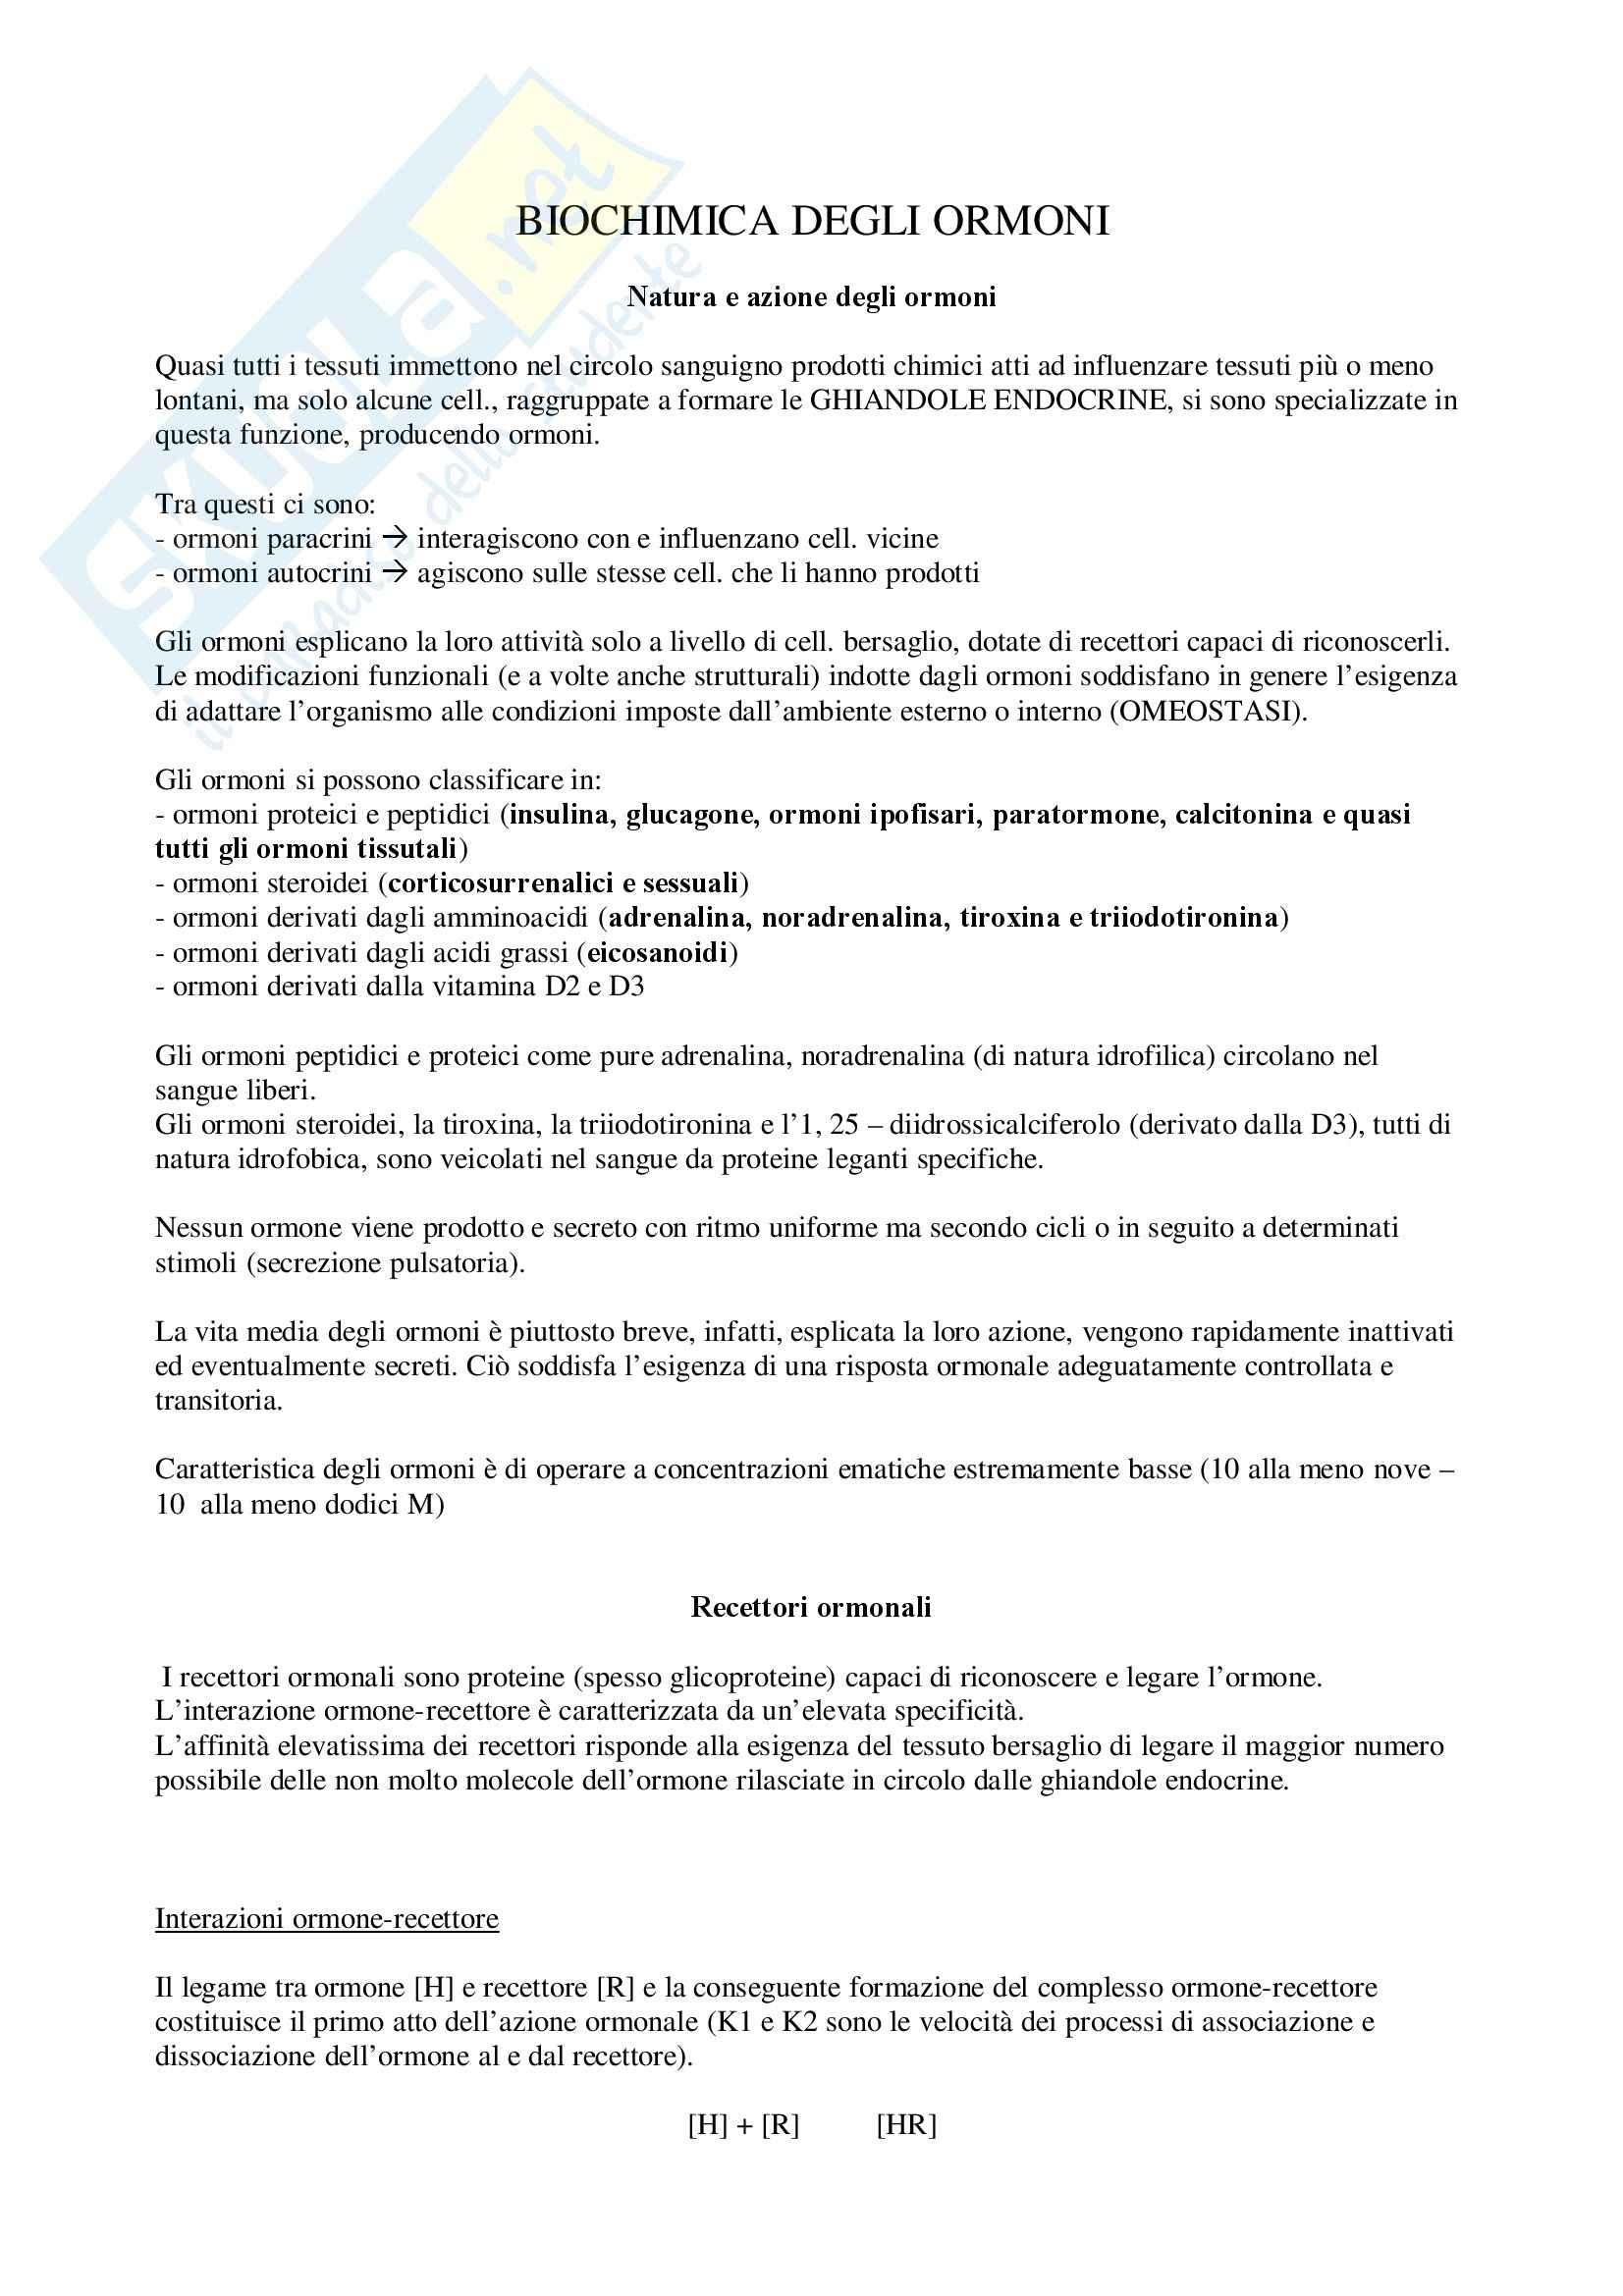 Biochimica II – Ormoni